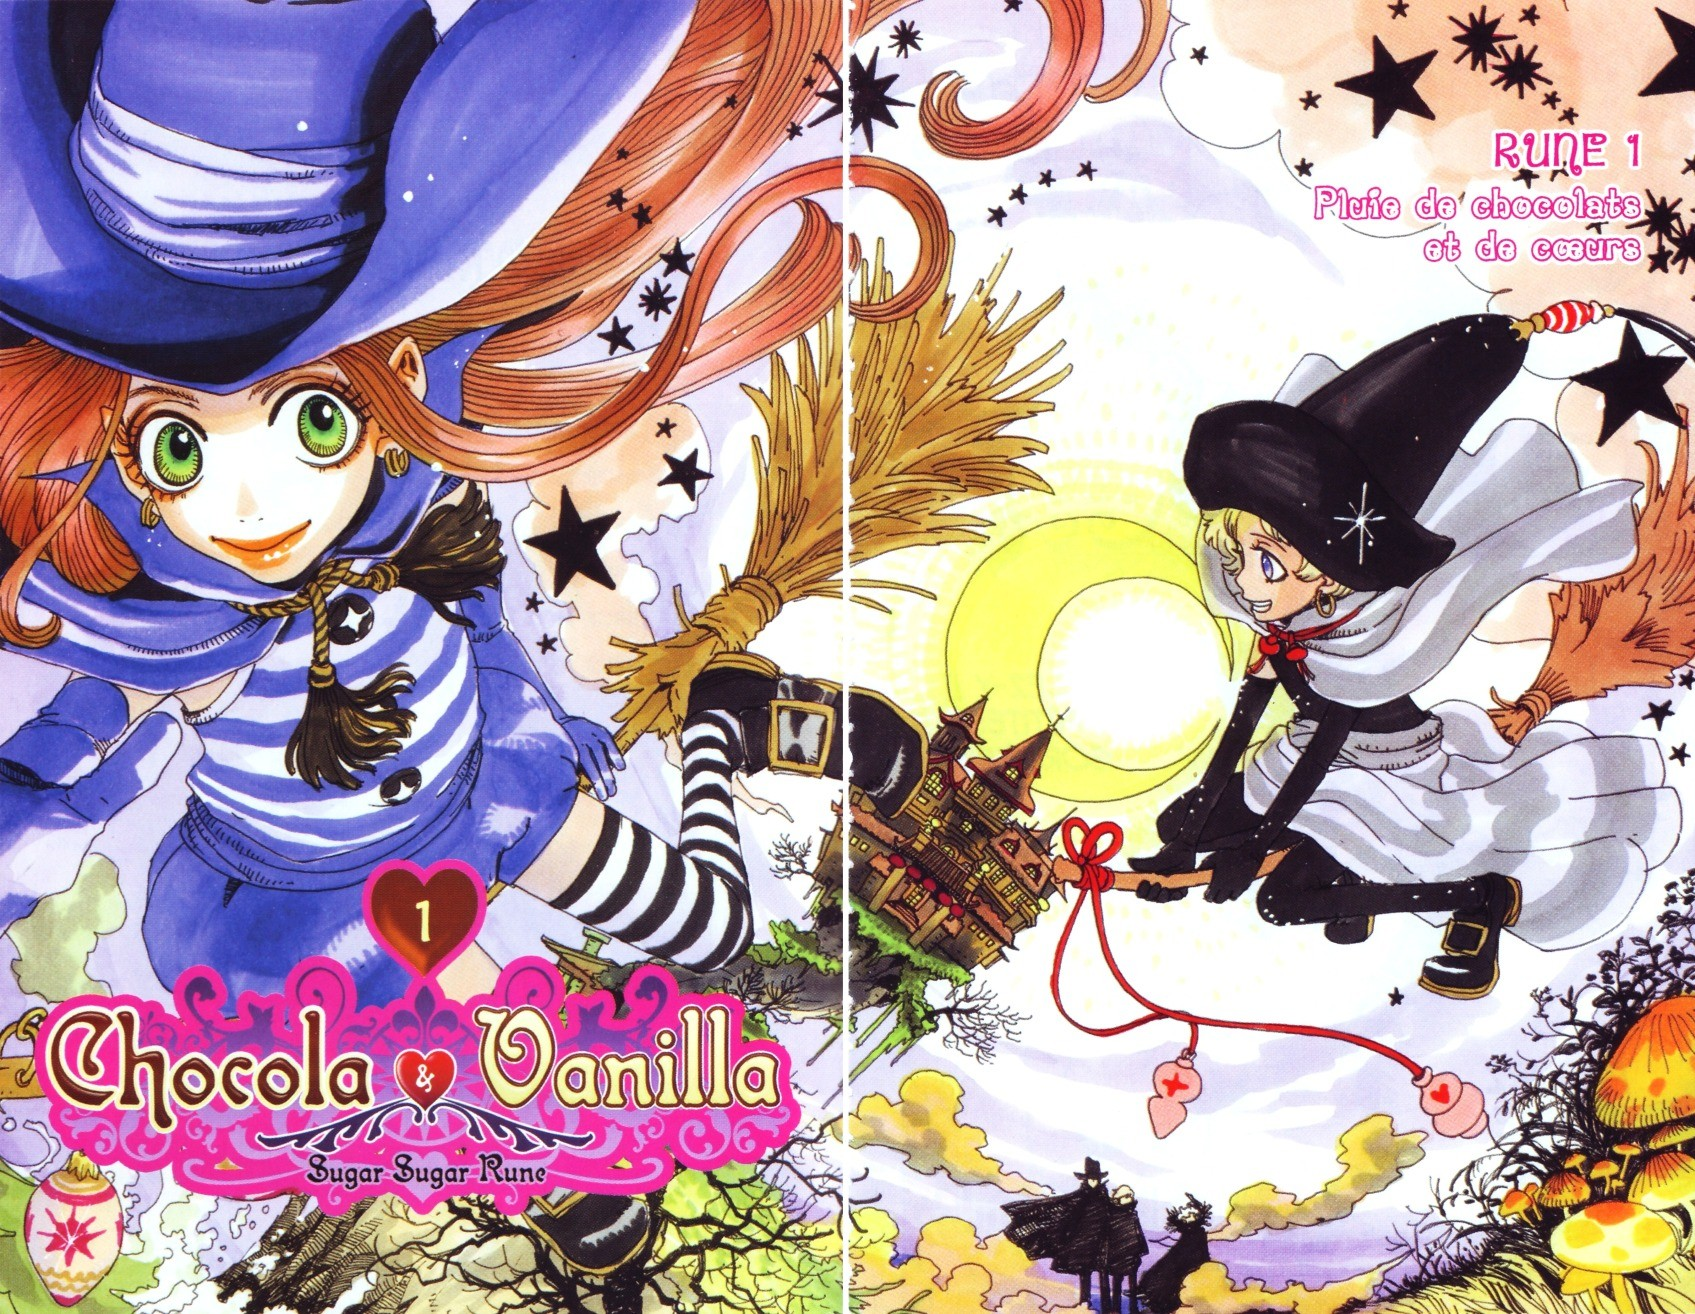 Sugar Sugar Rune - Moyoco Anno - Image #21501 - Zerochan Anime ...